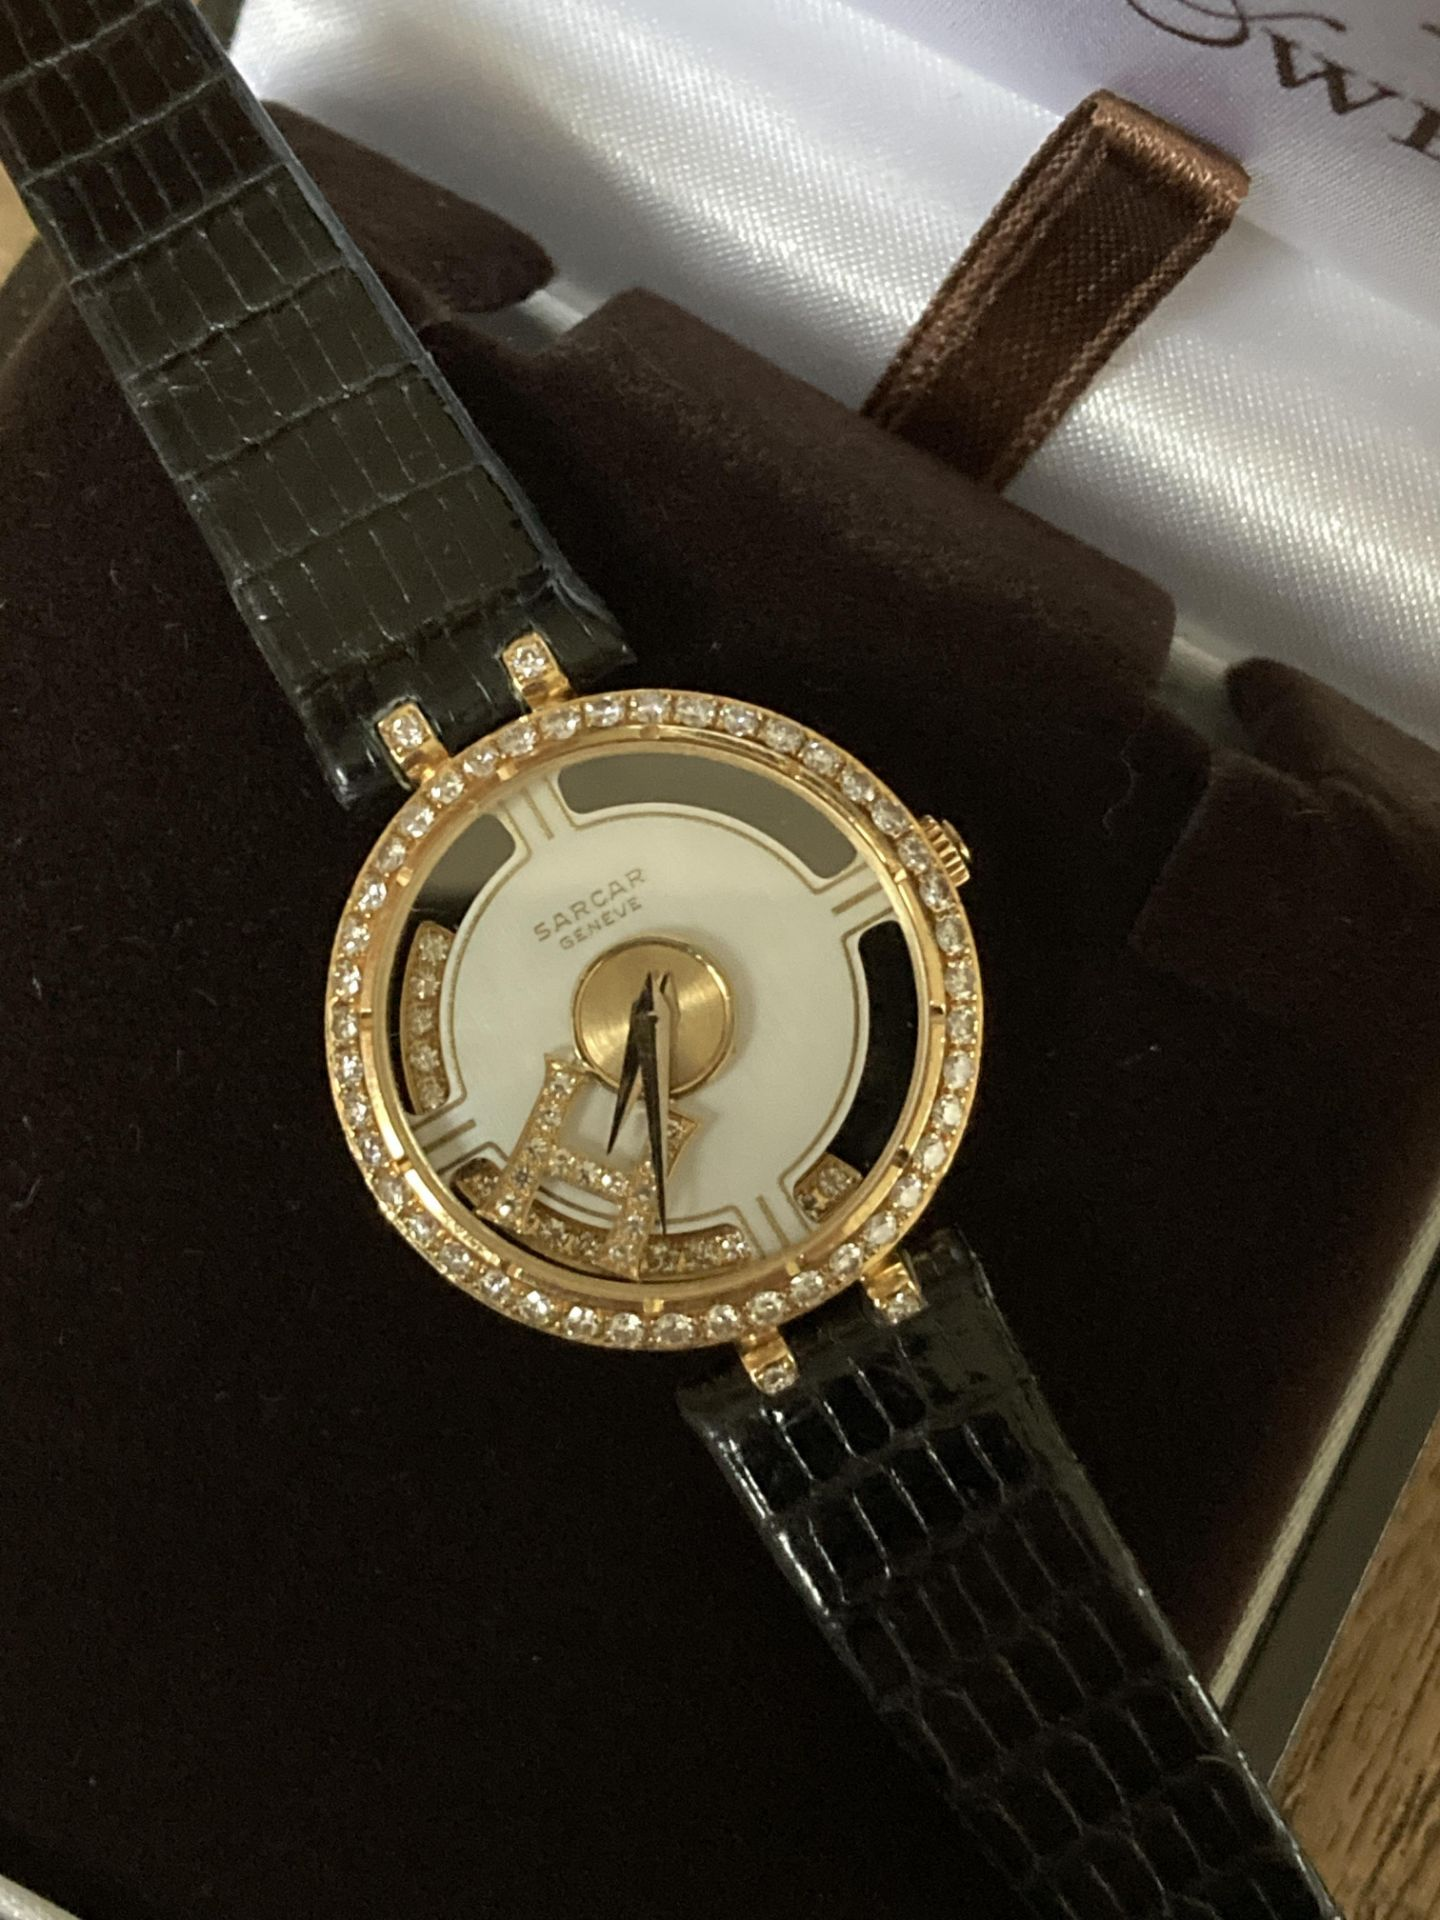 SARCAR GENEVE DIAMOND SET WATCH - 25MM